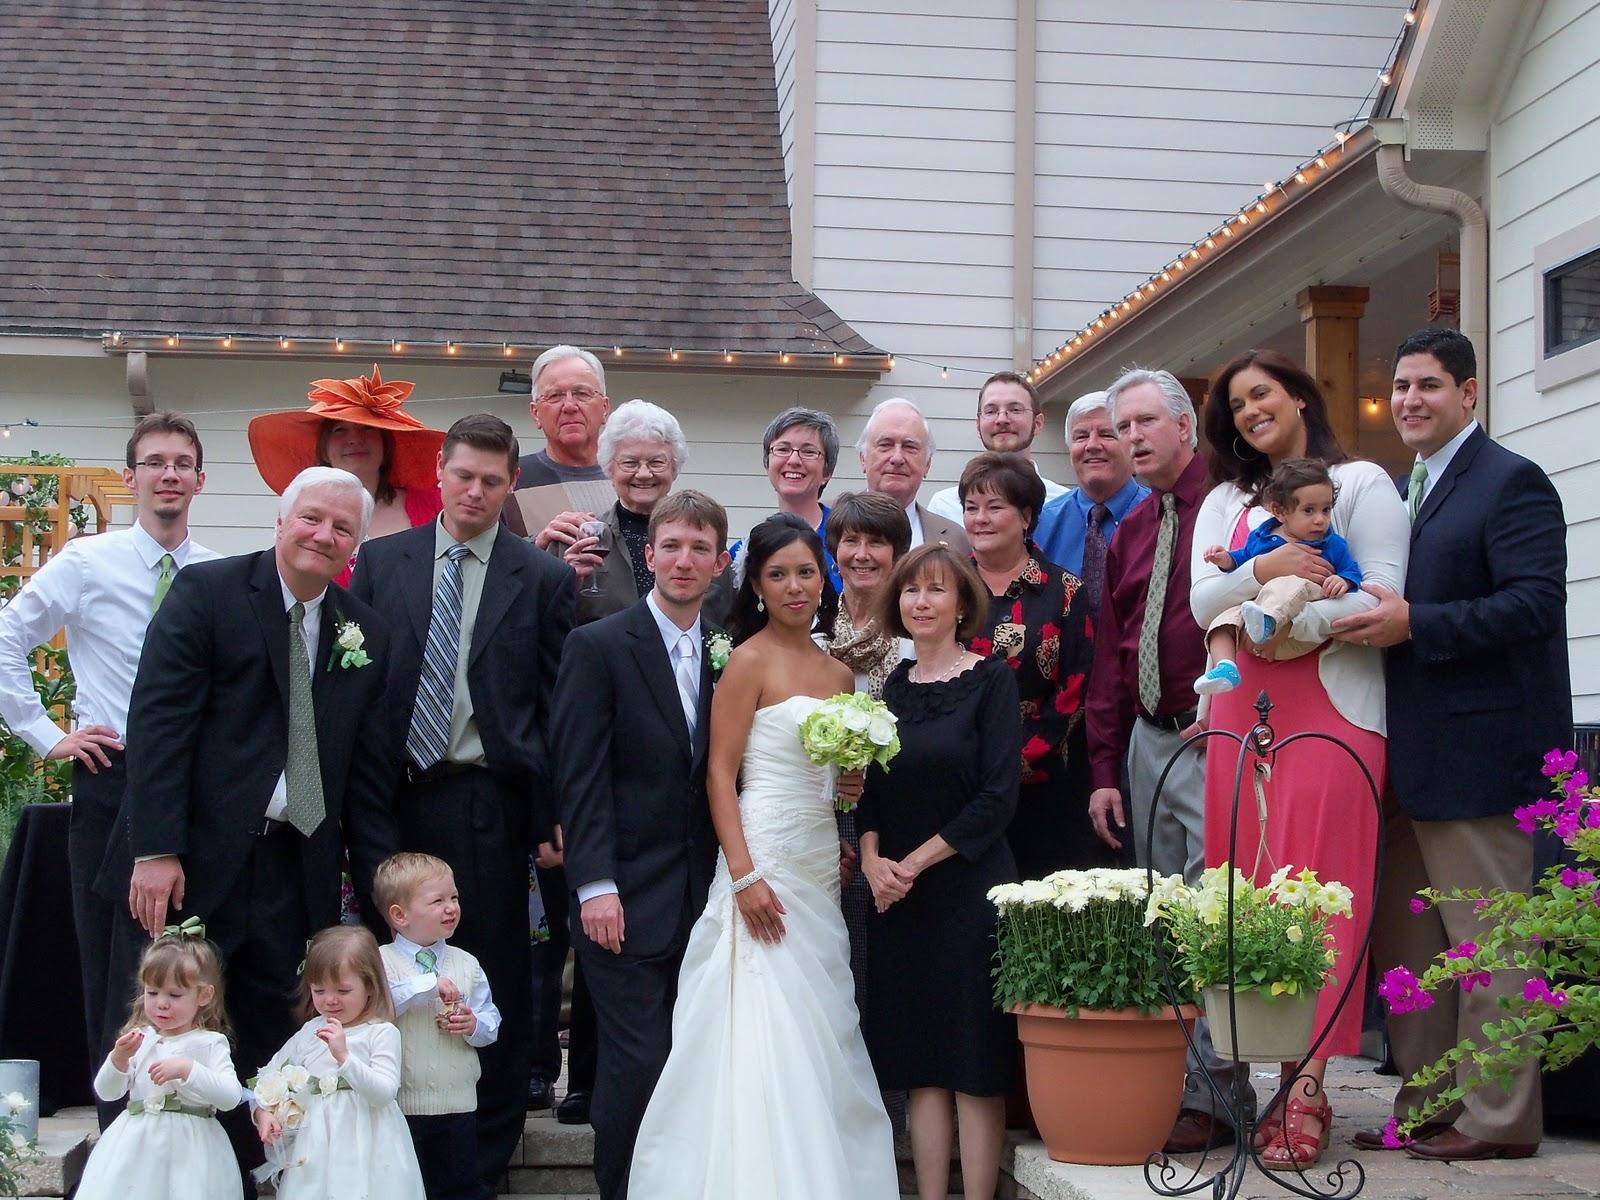 Ben and Jessica Coons wedding - 115_0805.JPG